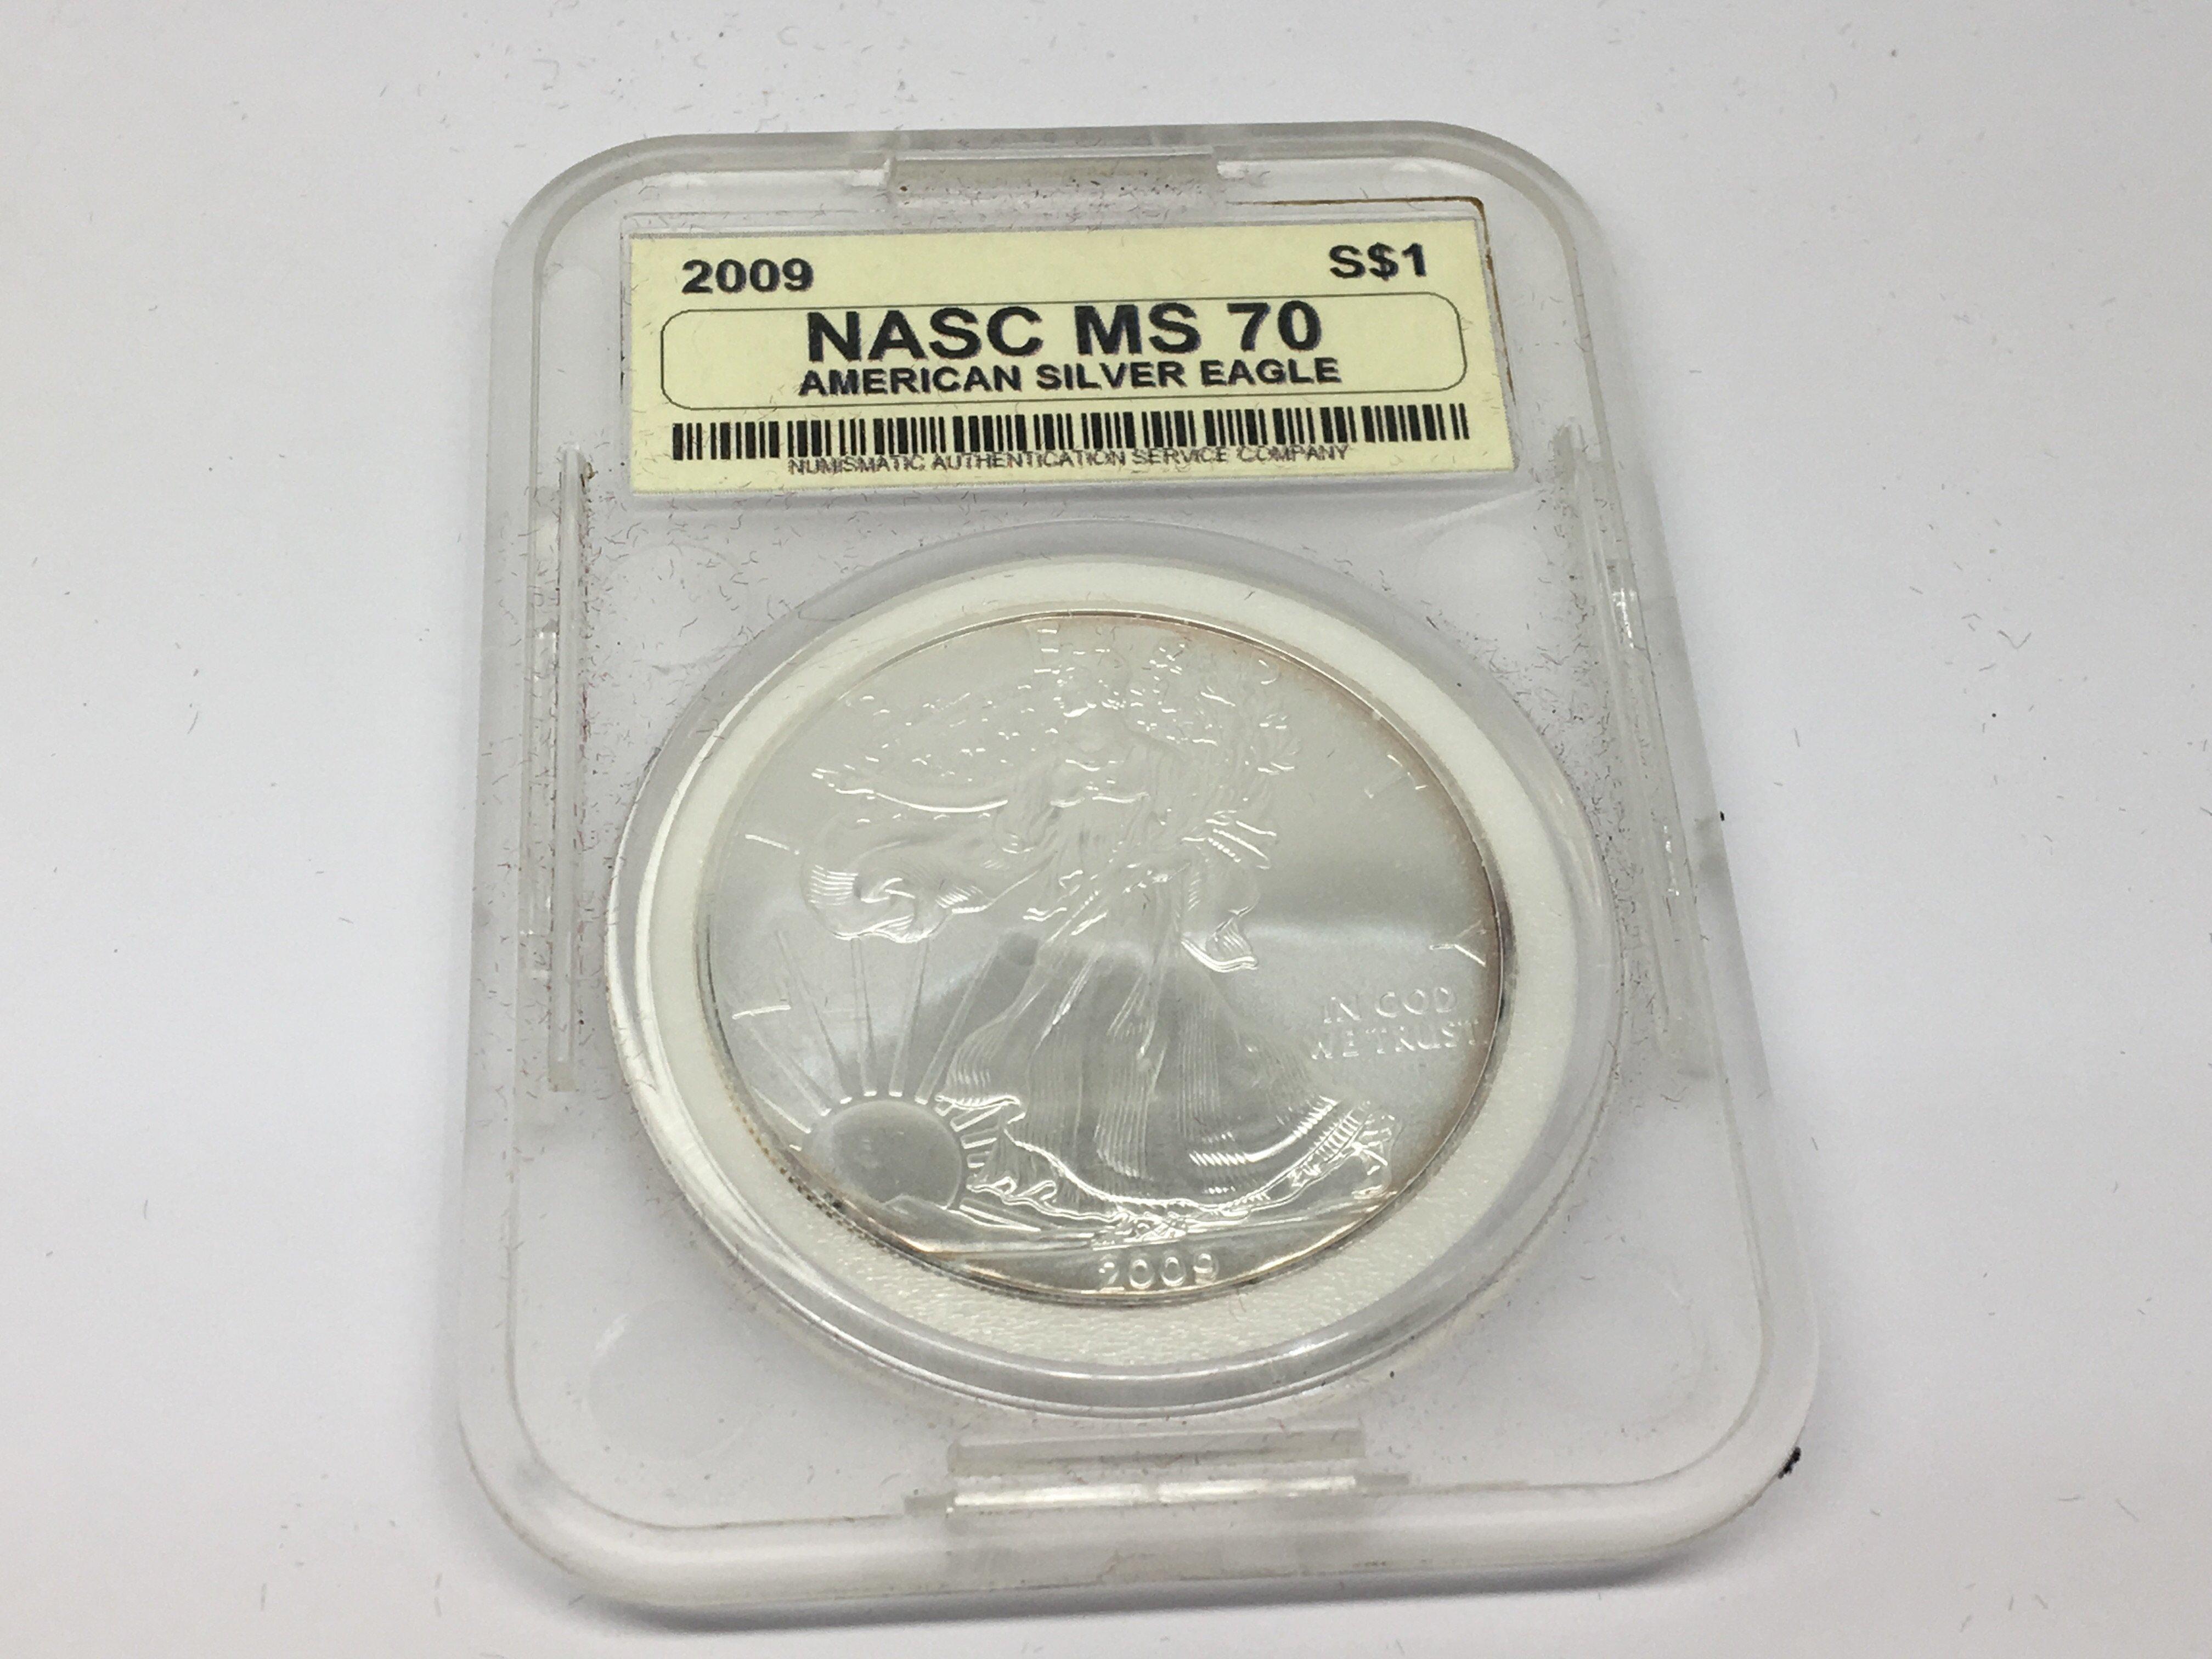 Lot 115 - A Silver 2009 MS70 American silver (9.99%) dollar